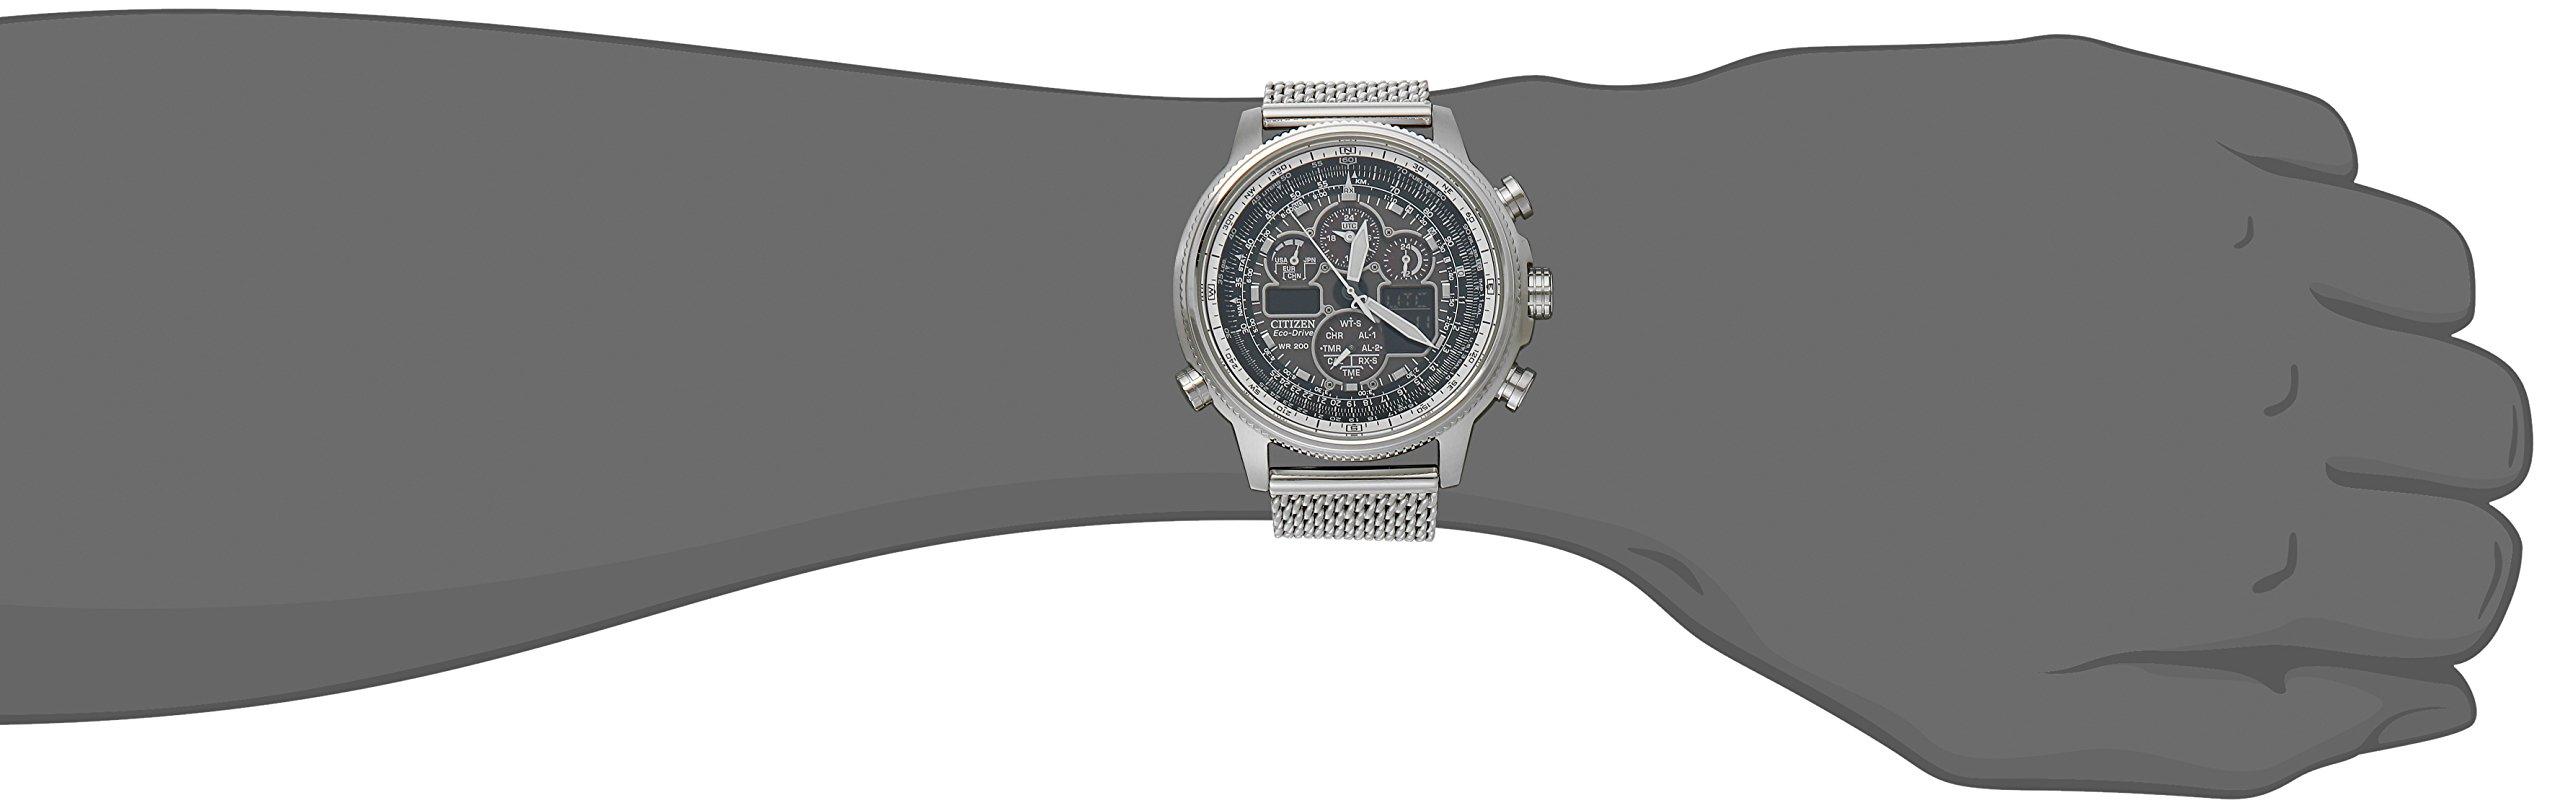 Citizen Eco-Drive Men's JY8030-83E Navihawk A-T Analog Display Silver Watch by Citizen (Image #2)